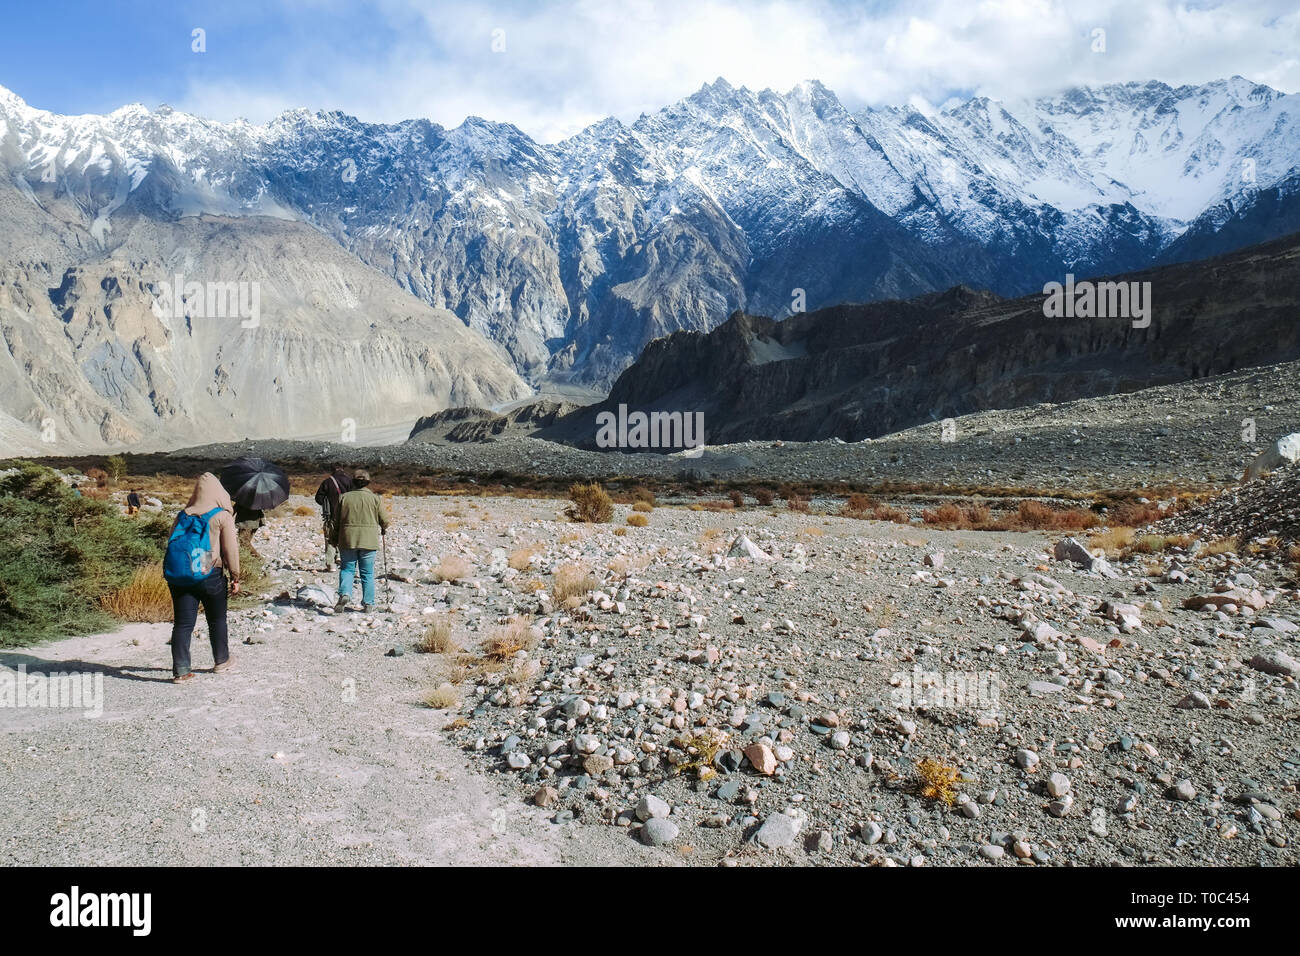 People walking along the trekking trail in Passu. Gilgit, Baltistan, Pakistan. - Stock Image